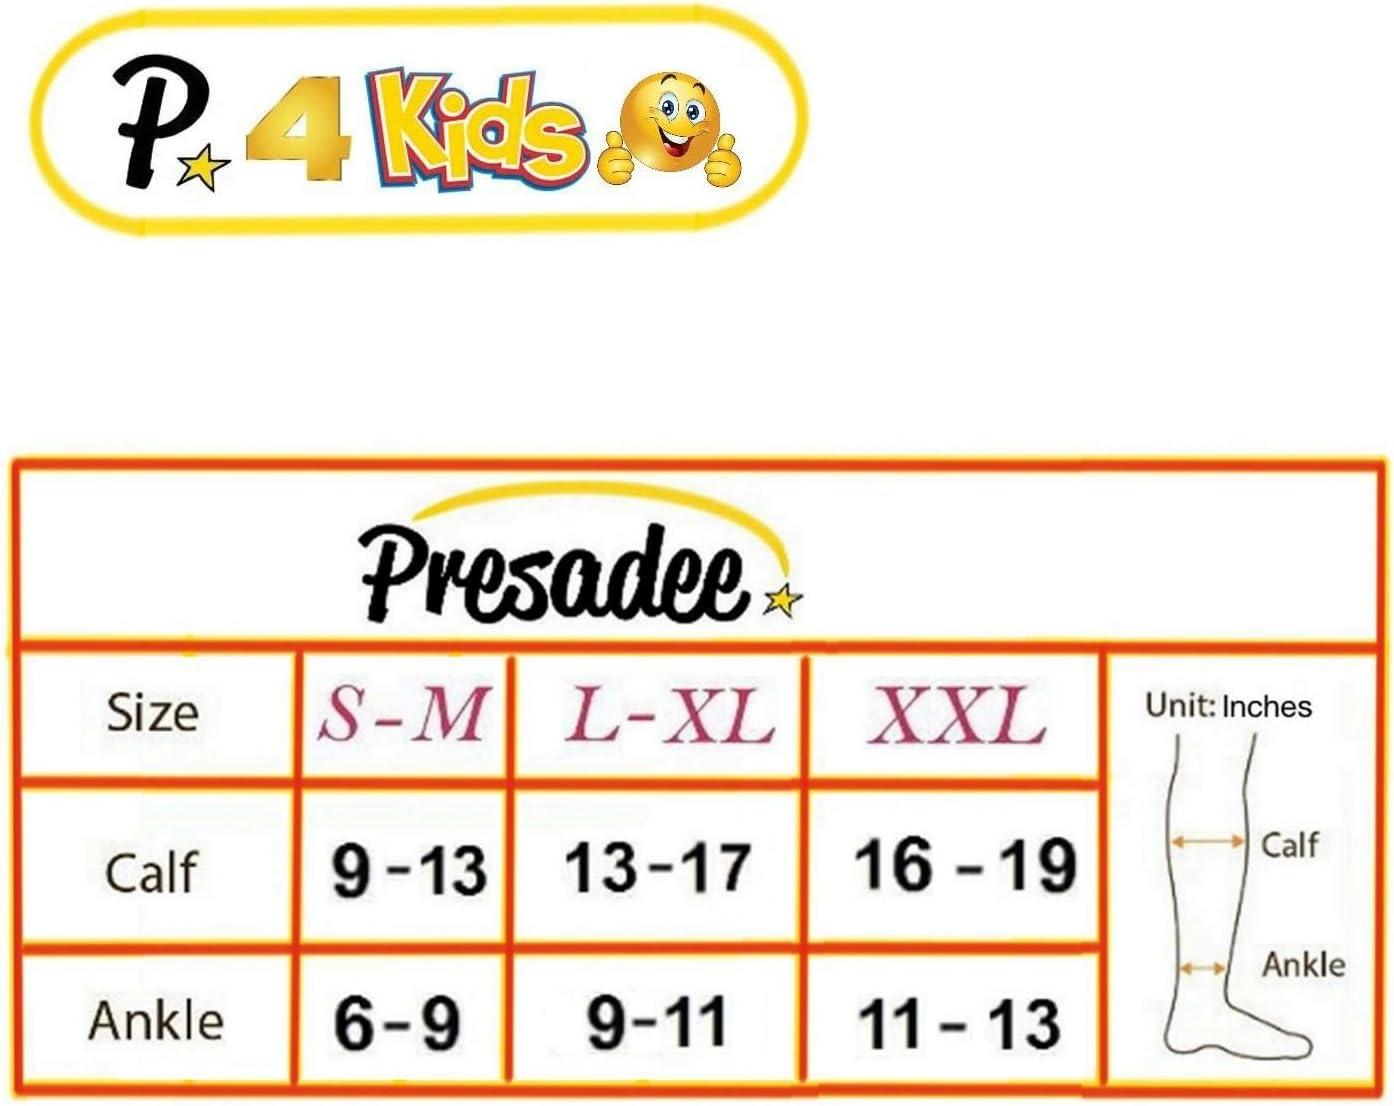 Presadee Kid/'s Edition Easy Zipper Compression Socks Knee Length Energize Leg Circulation Performance Fatigue Support Black, 2XL